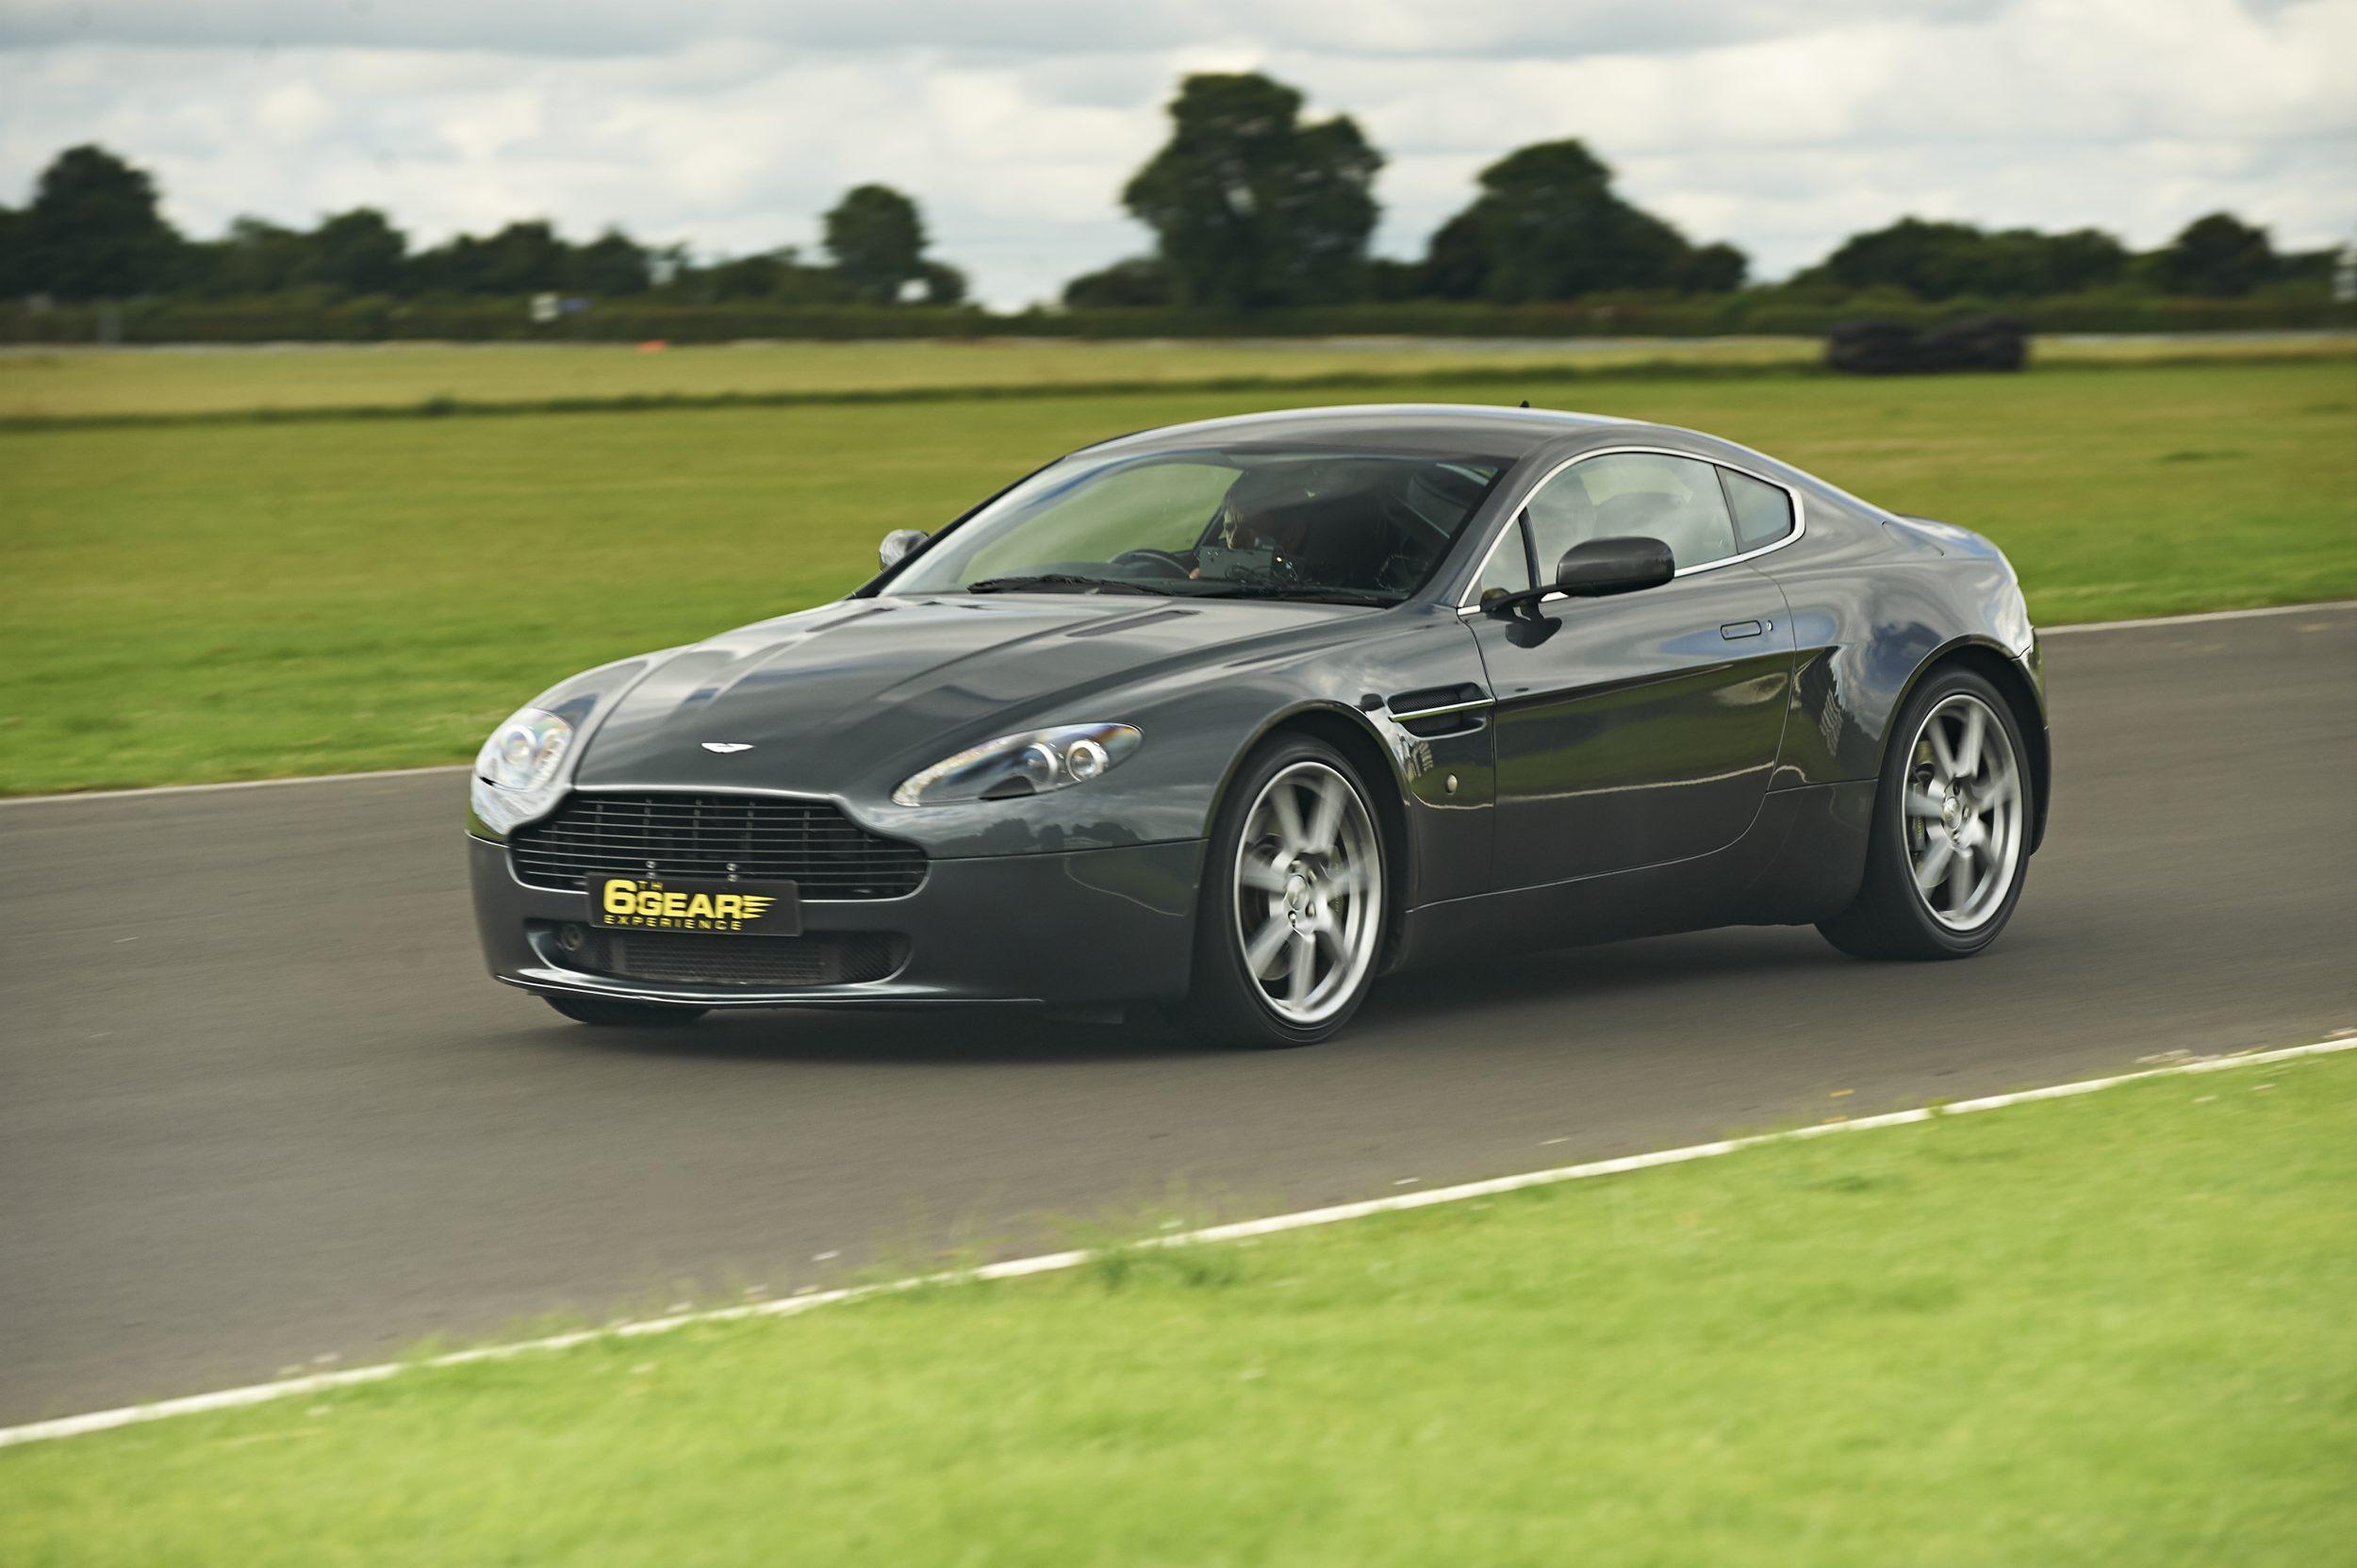 Aston Martin Dbs Experience Days